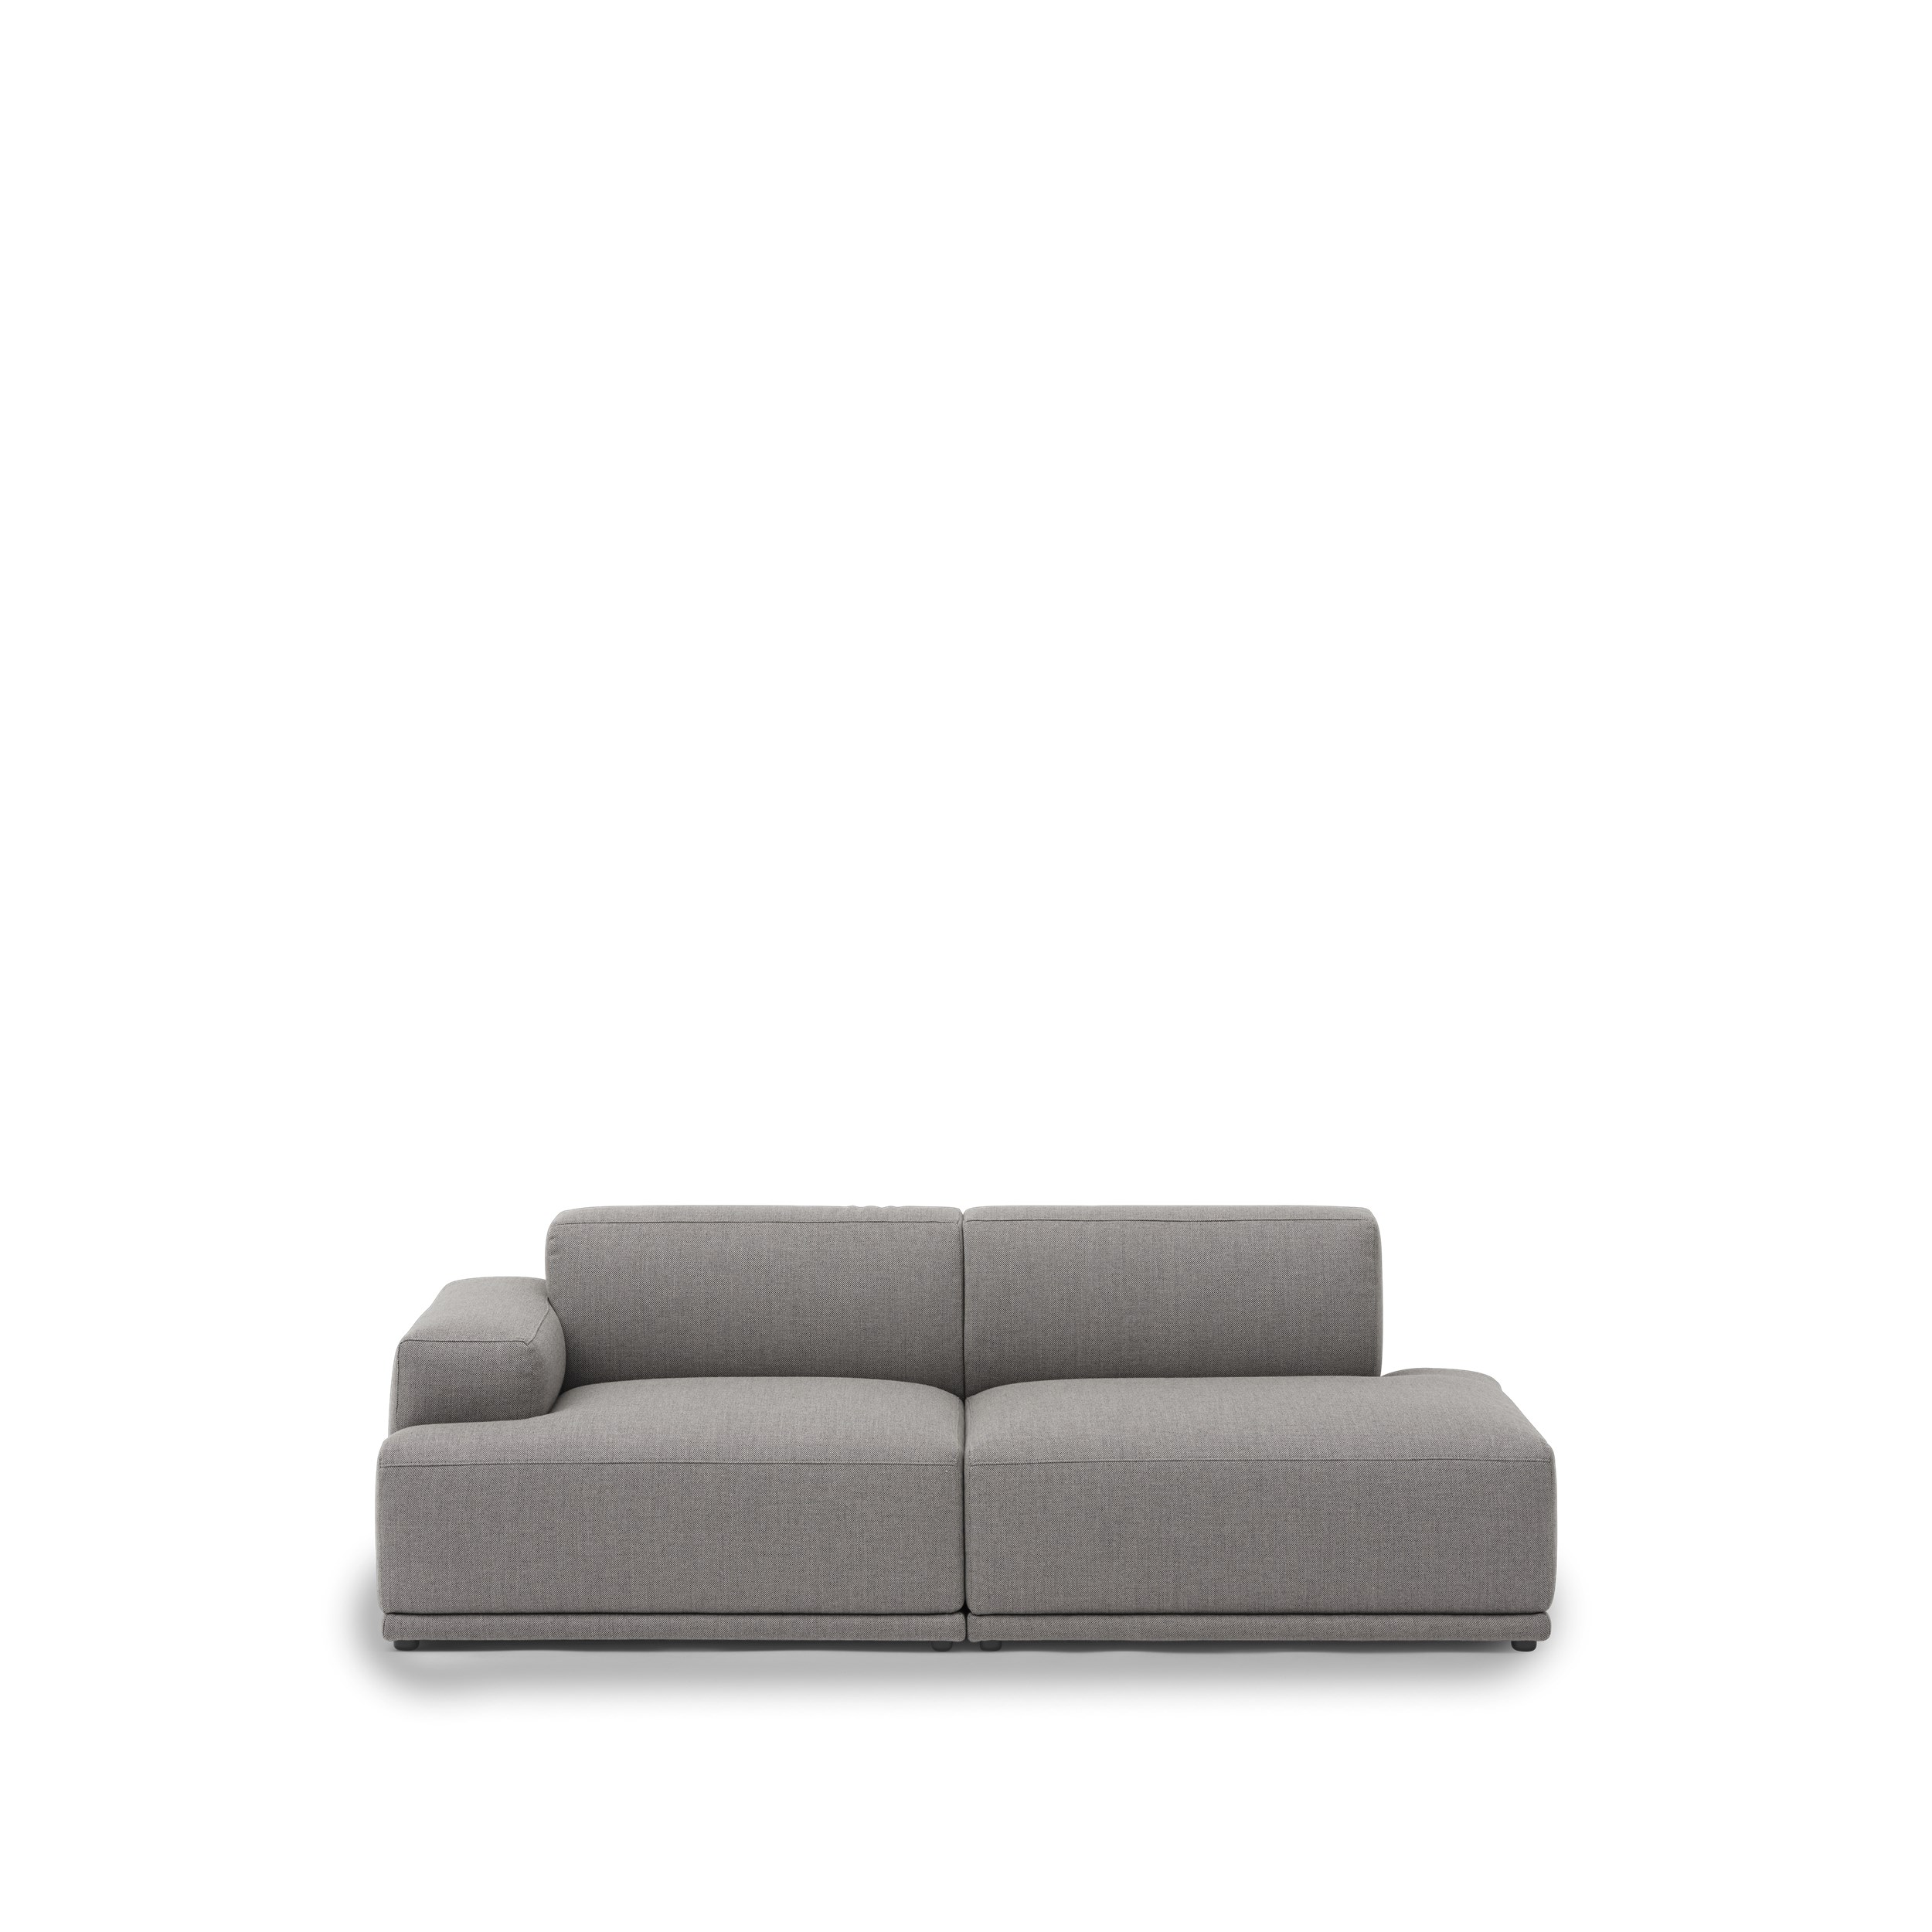 Connect Modular SOFT Sofa No 6